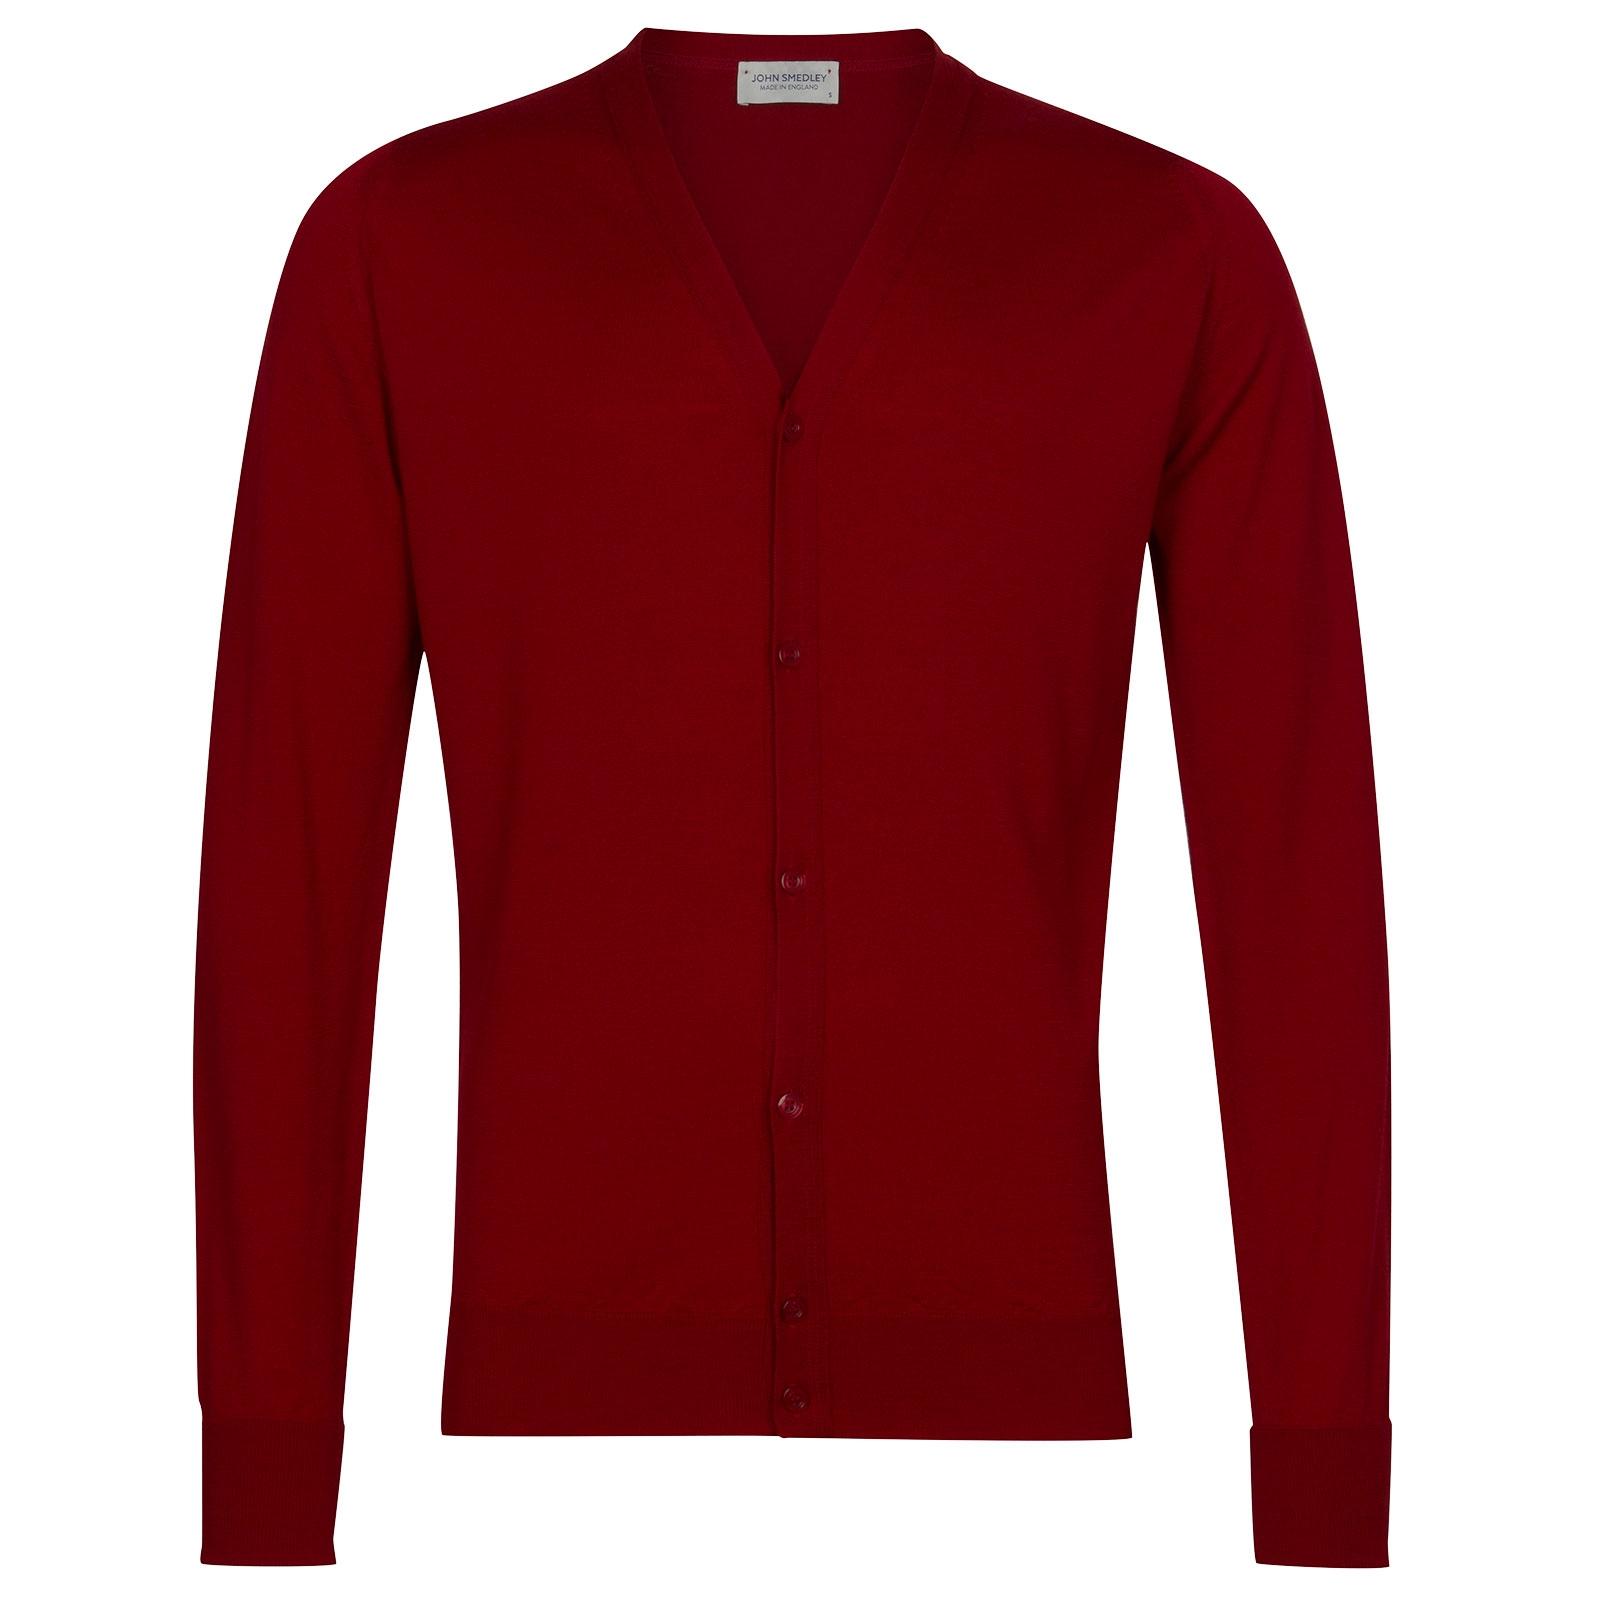 John Smedley Bryn Merino Wool Cardigan in Thermal Red-M